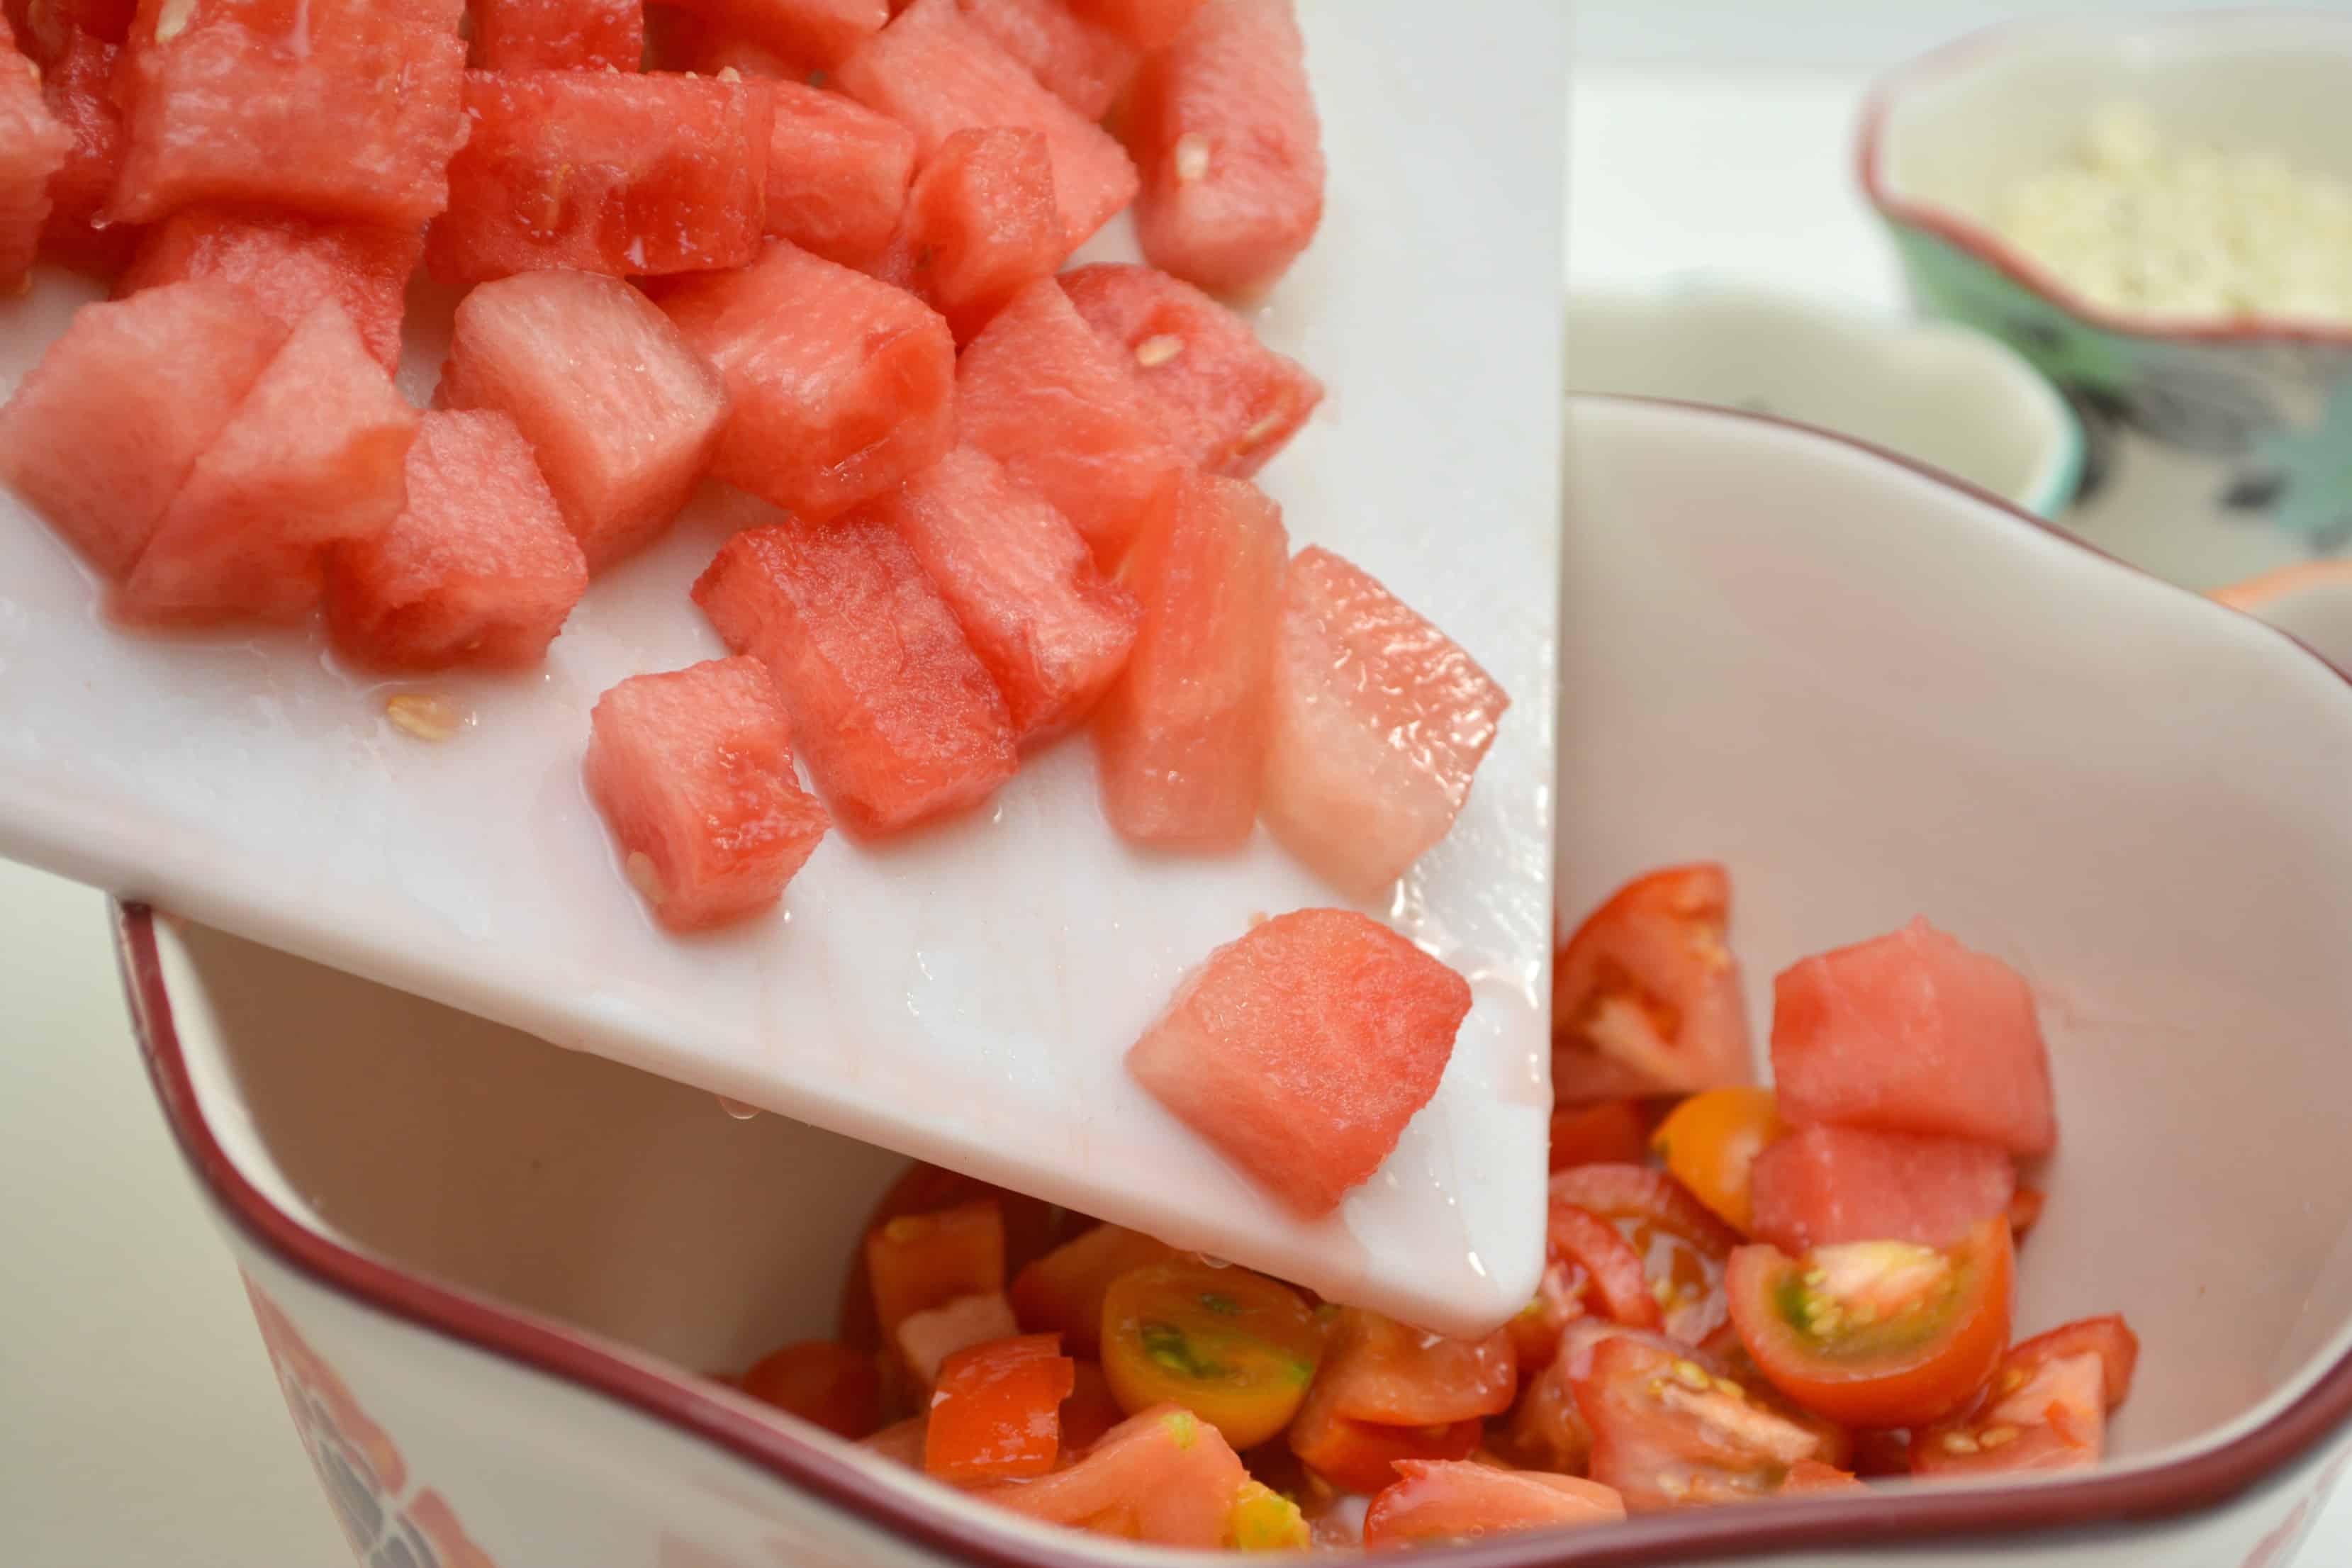 diced watermelon on cutting board